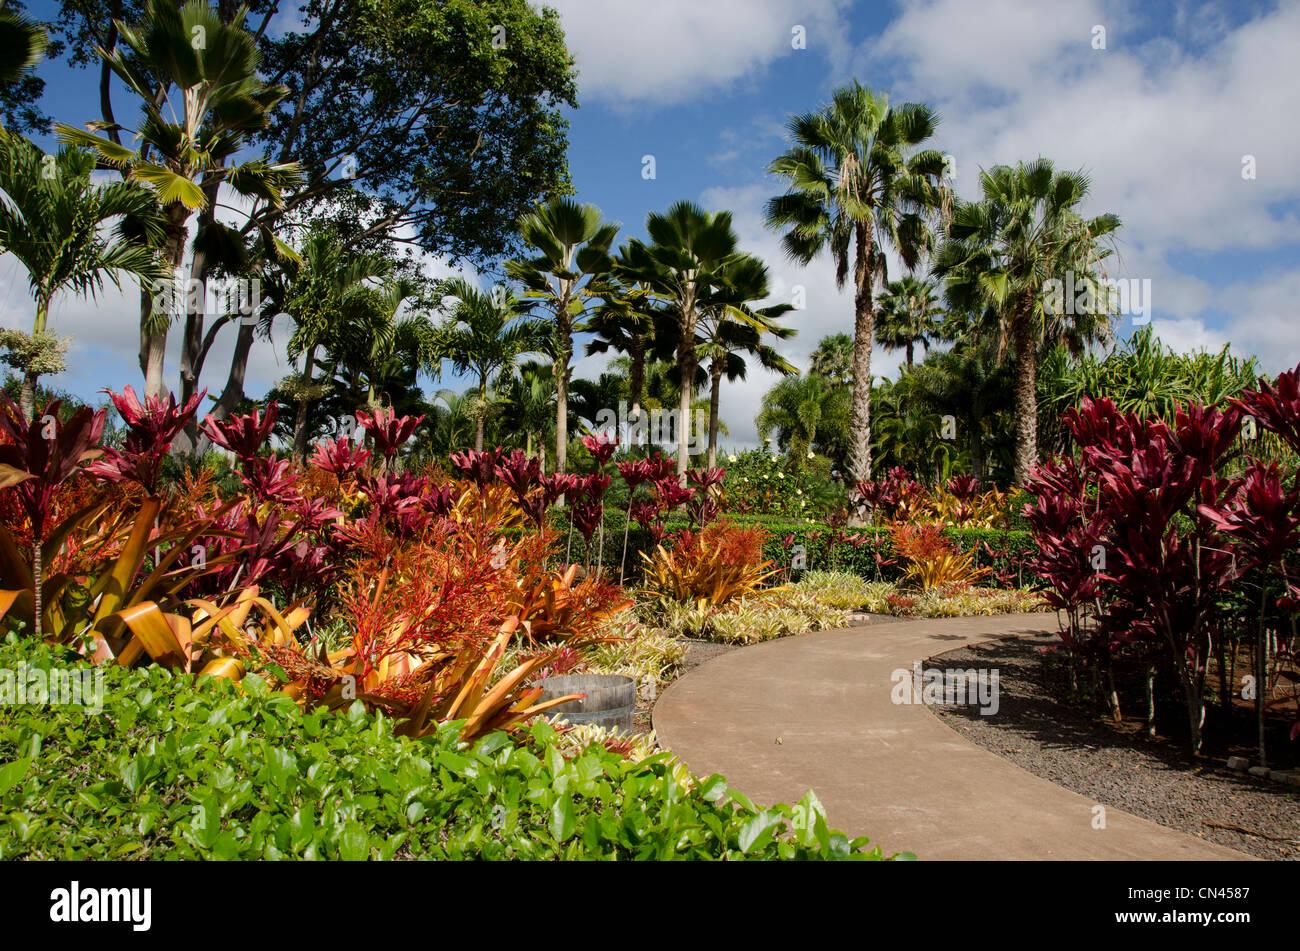 The Plantation Garden Tour at the Dole Plantation in Wahiawa, Oahu, Hawaii - Stock Image